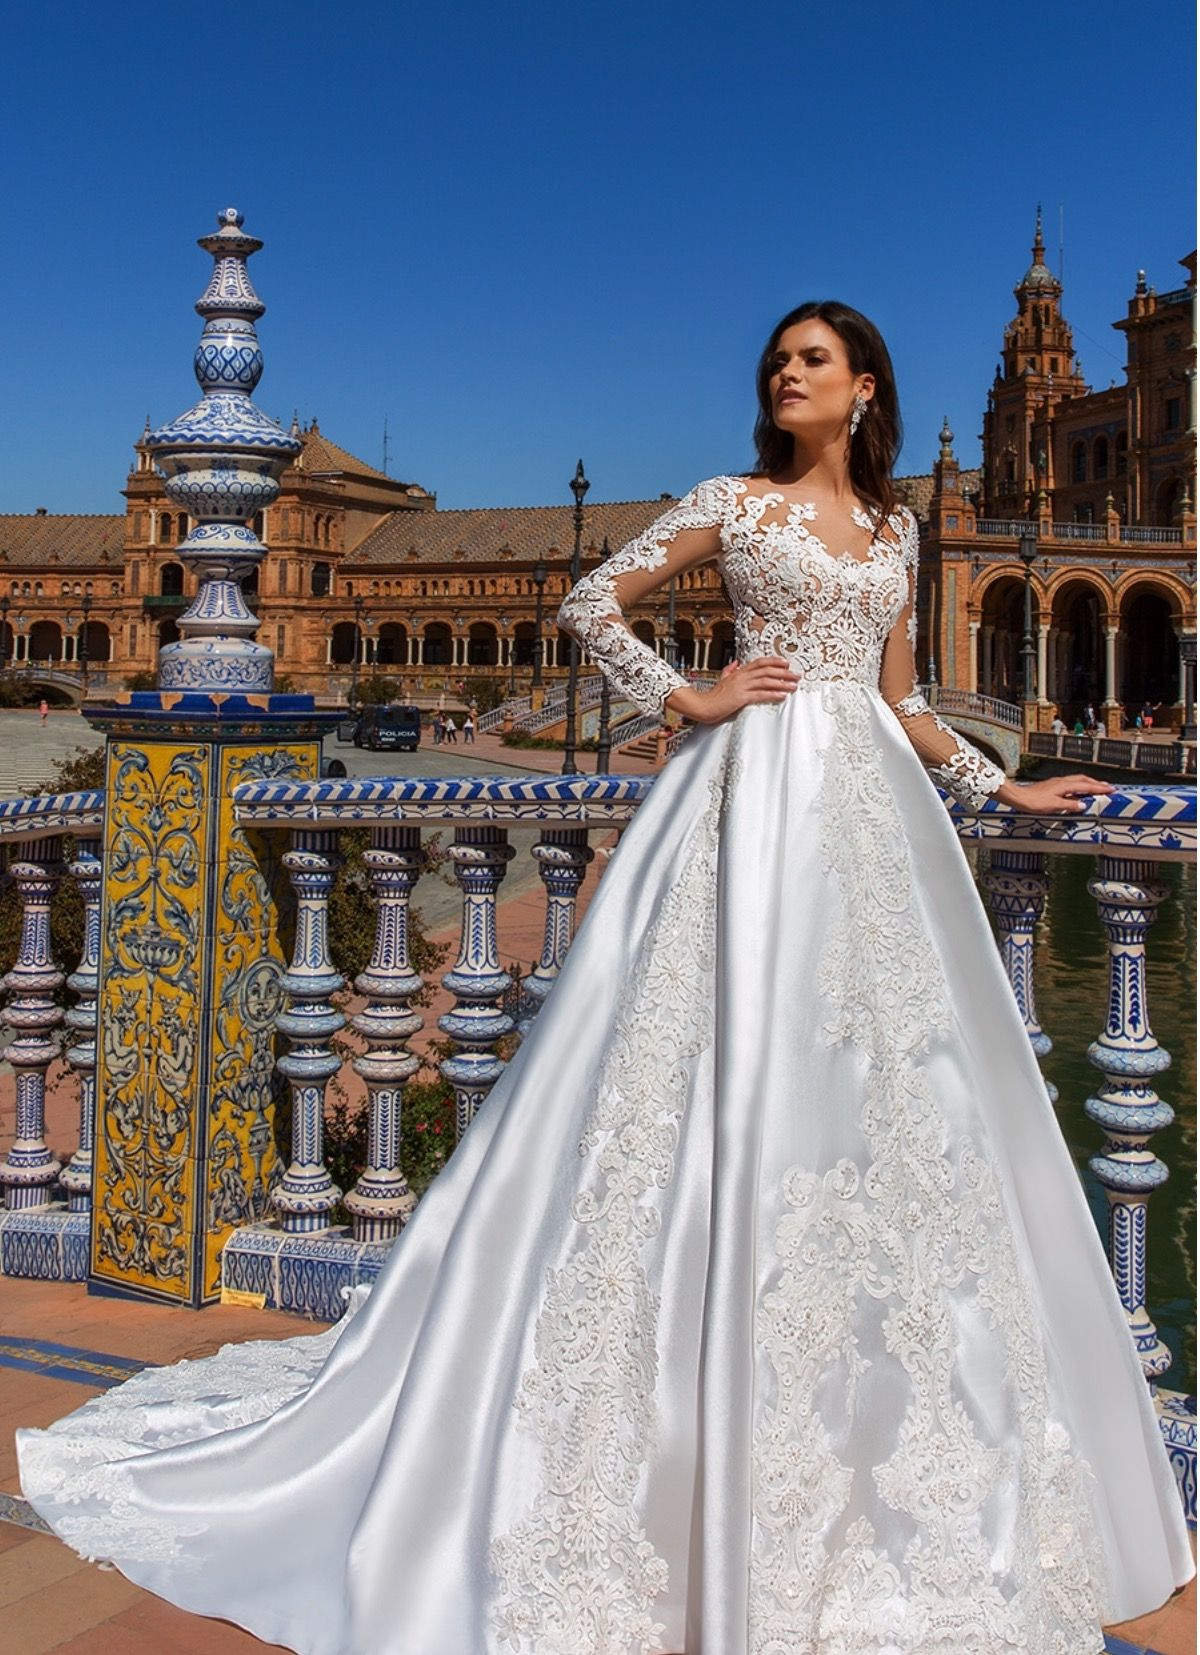 Pin by WeddingZ on Wedding Dresses | Pinterest | Wedding dress ...